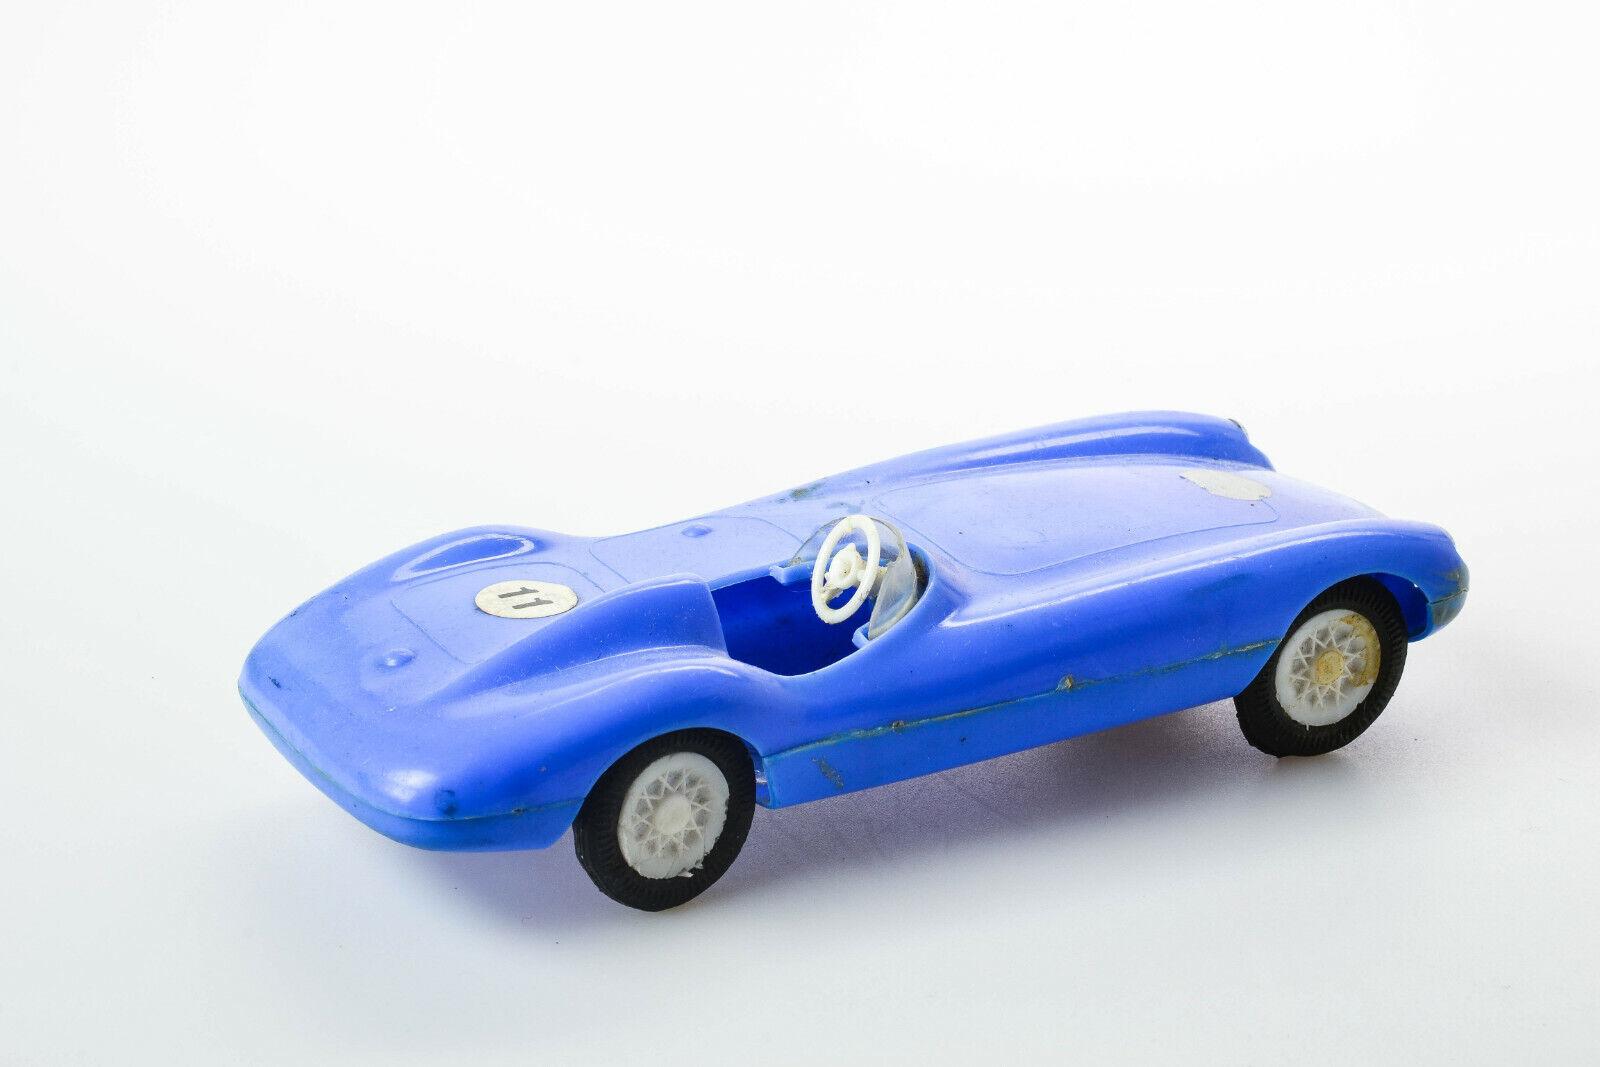 _AntiquePlastic leksakNice Race bile Fast Cabriolet Singapore gjorde 902 gammalt